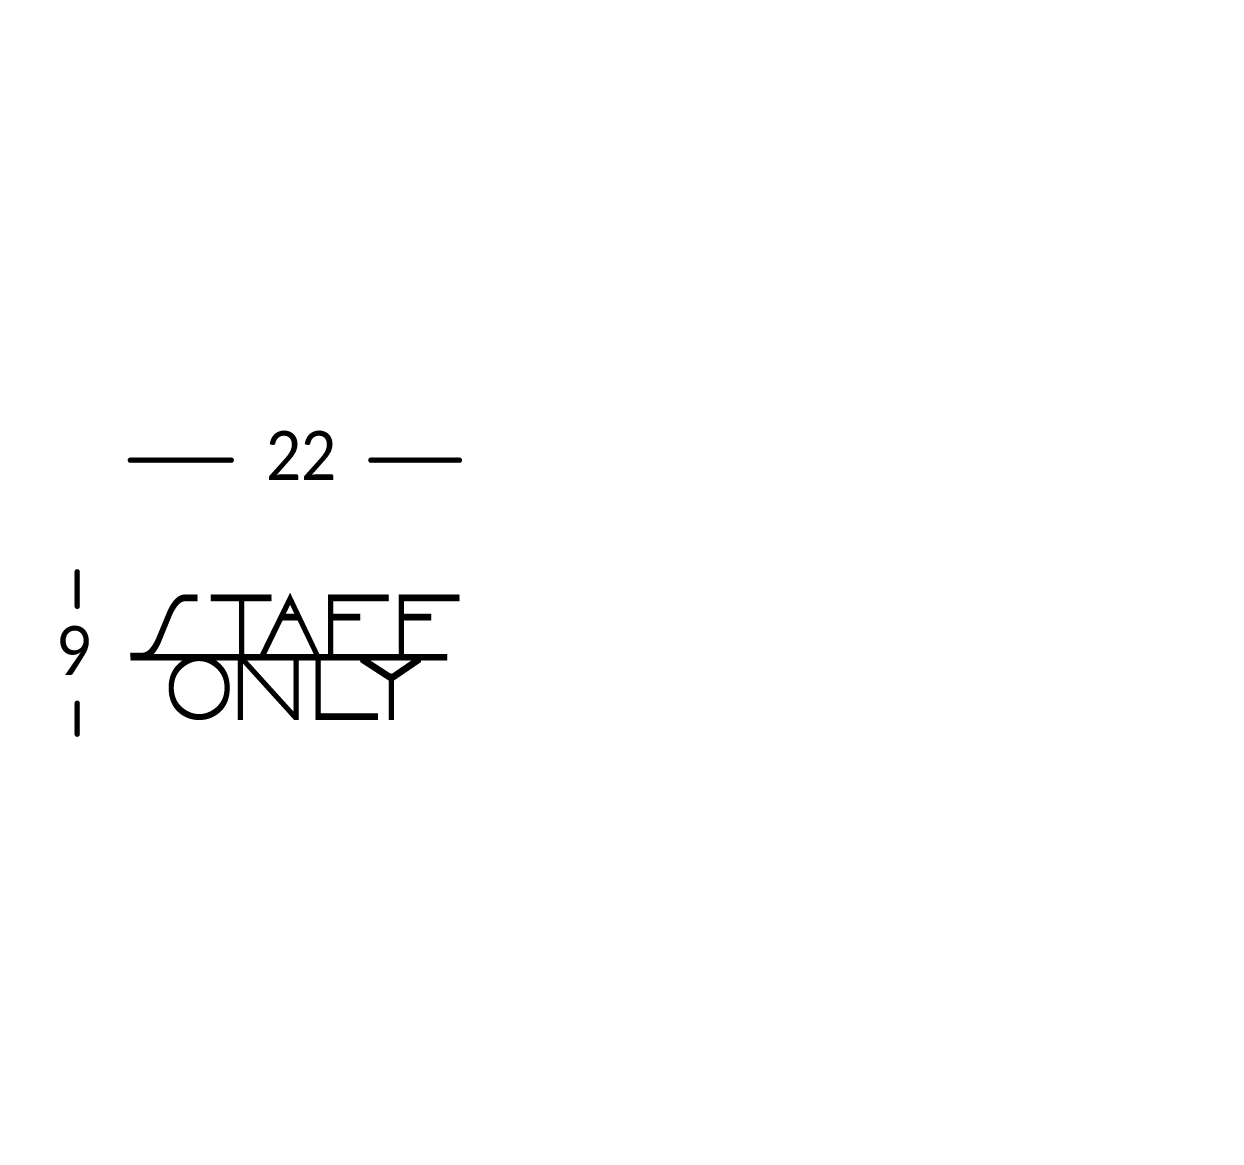 Inscripción grabada para la puerta, máximo 10 caracteres. Línea Sav.